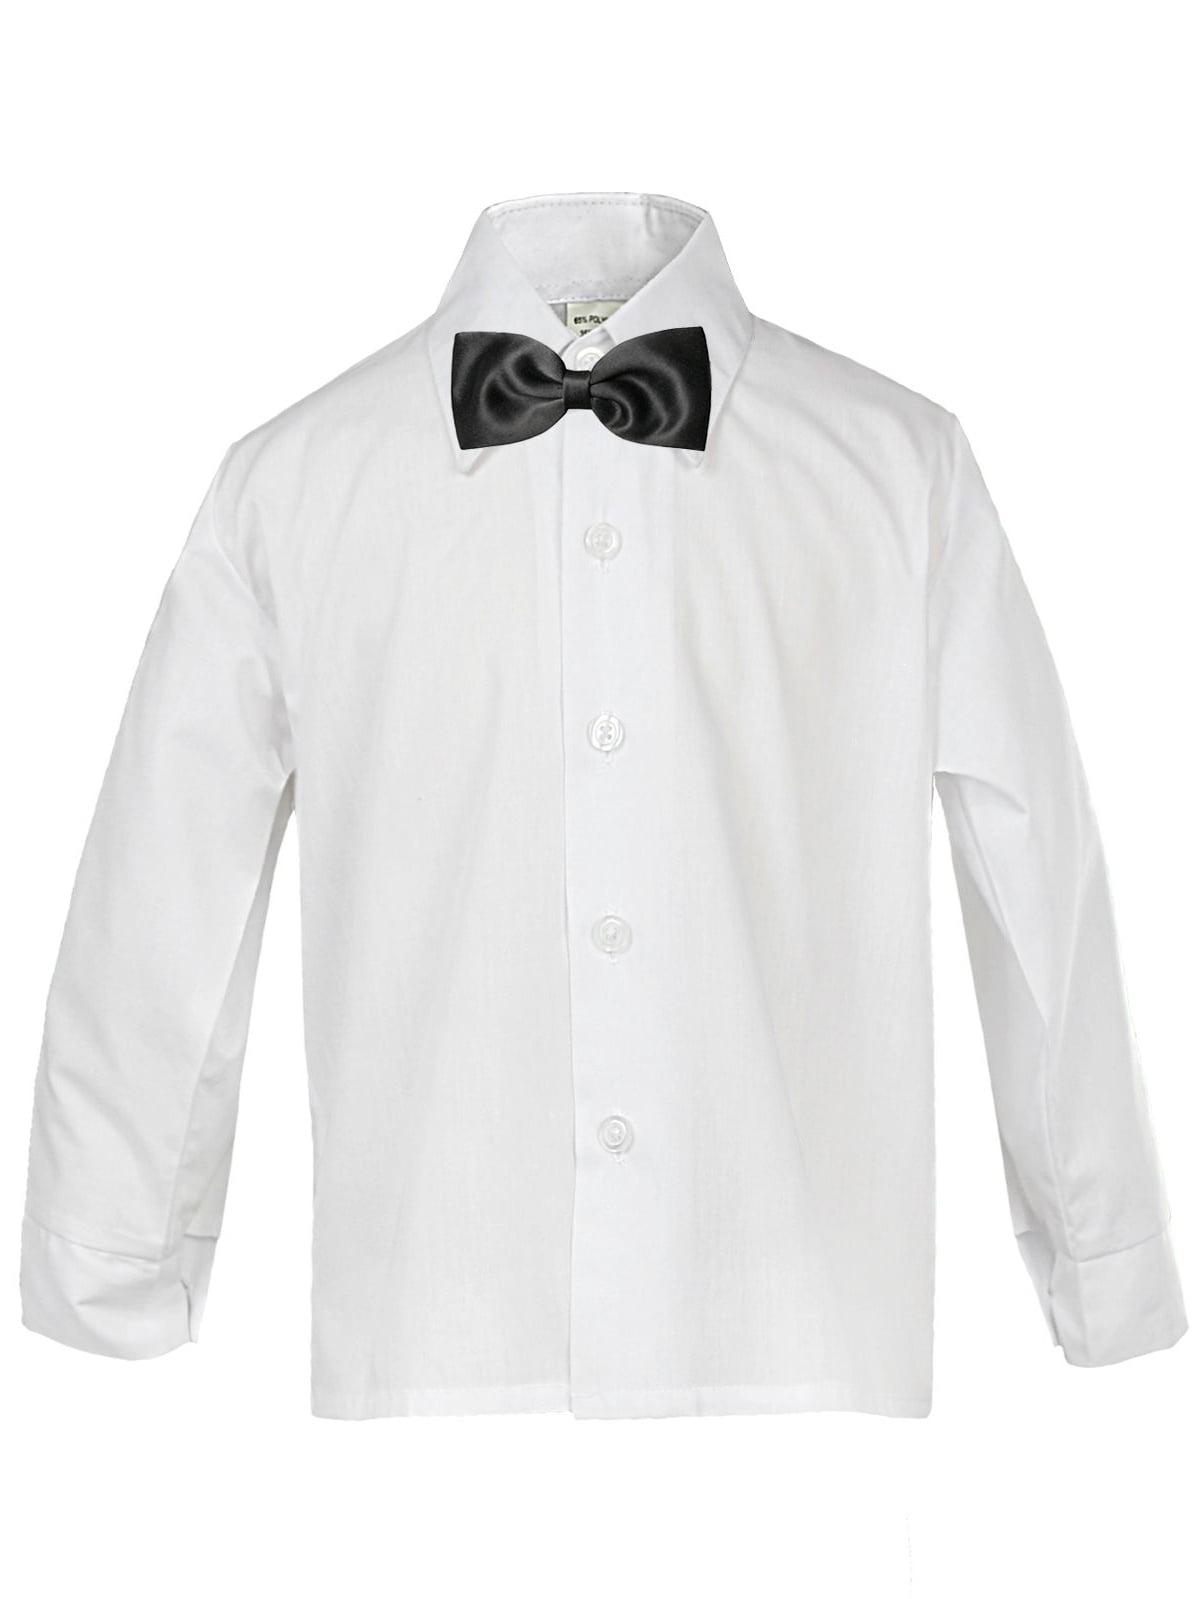 Classic Baby Boy Formal Tuxedo Suit WHITE Button Dress Shirt Black Bow tie SM-4T